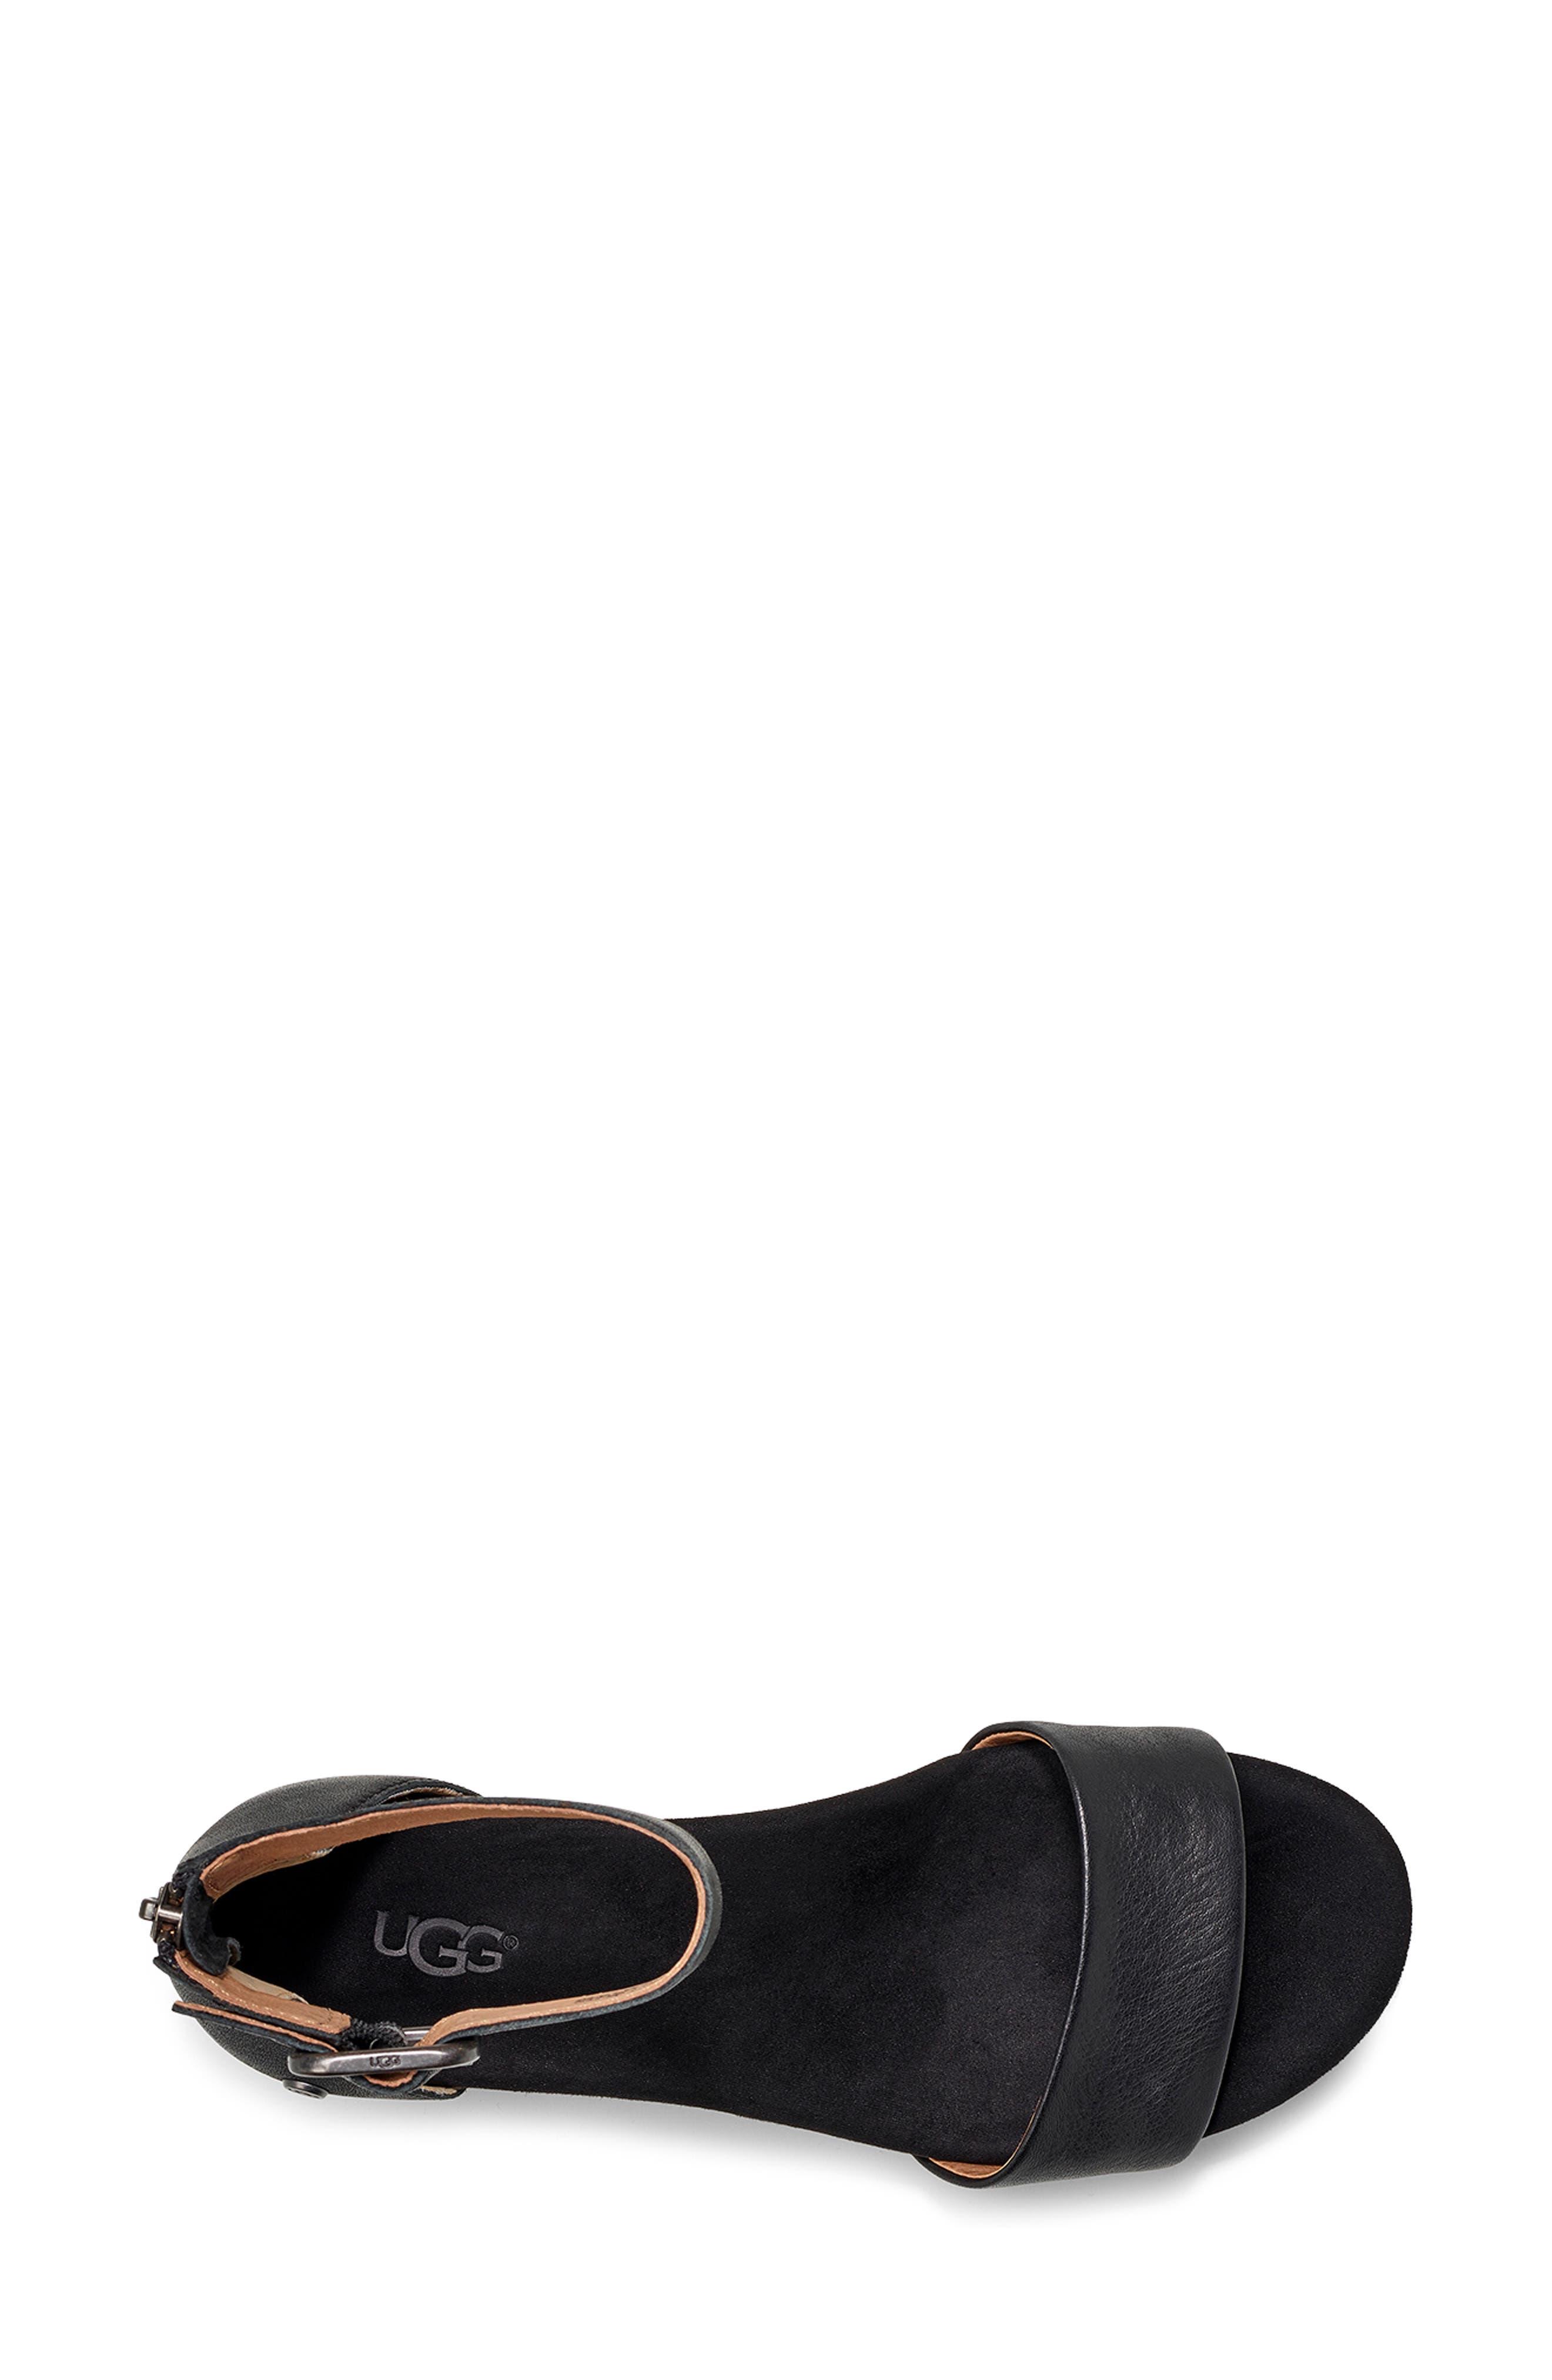 UGG<SUP>®</SUP>, Zoe II Wedge Sandal, Alternate thumbnail 4, color, BLACK LEATHER